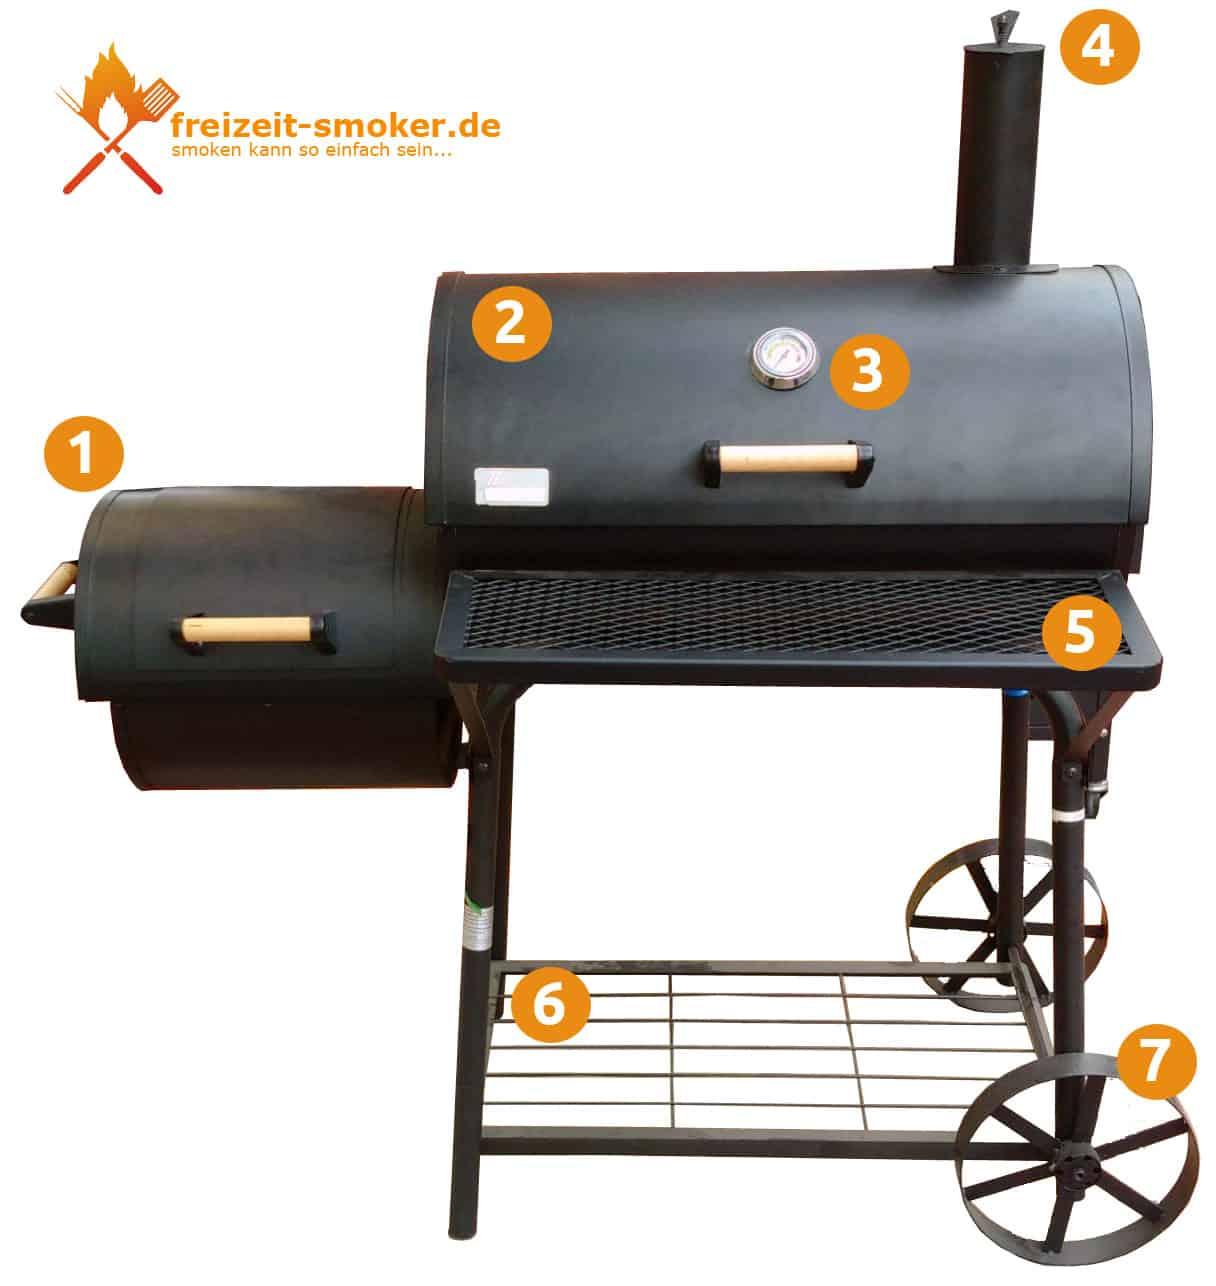 bbq smoker grill empfehlungen tipps tricks faq. Black Bedroom Furniture Sets. Home Design Ideas